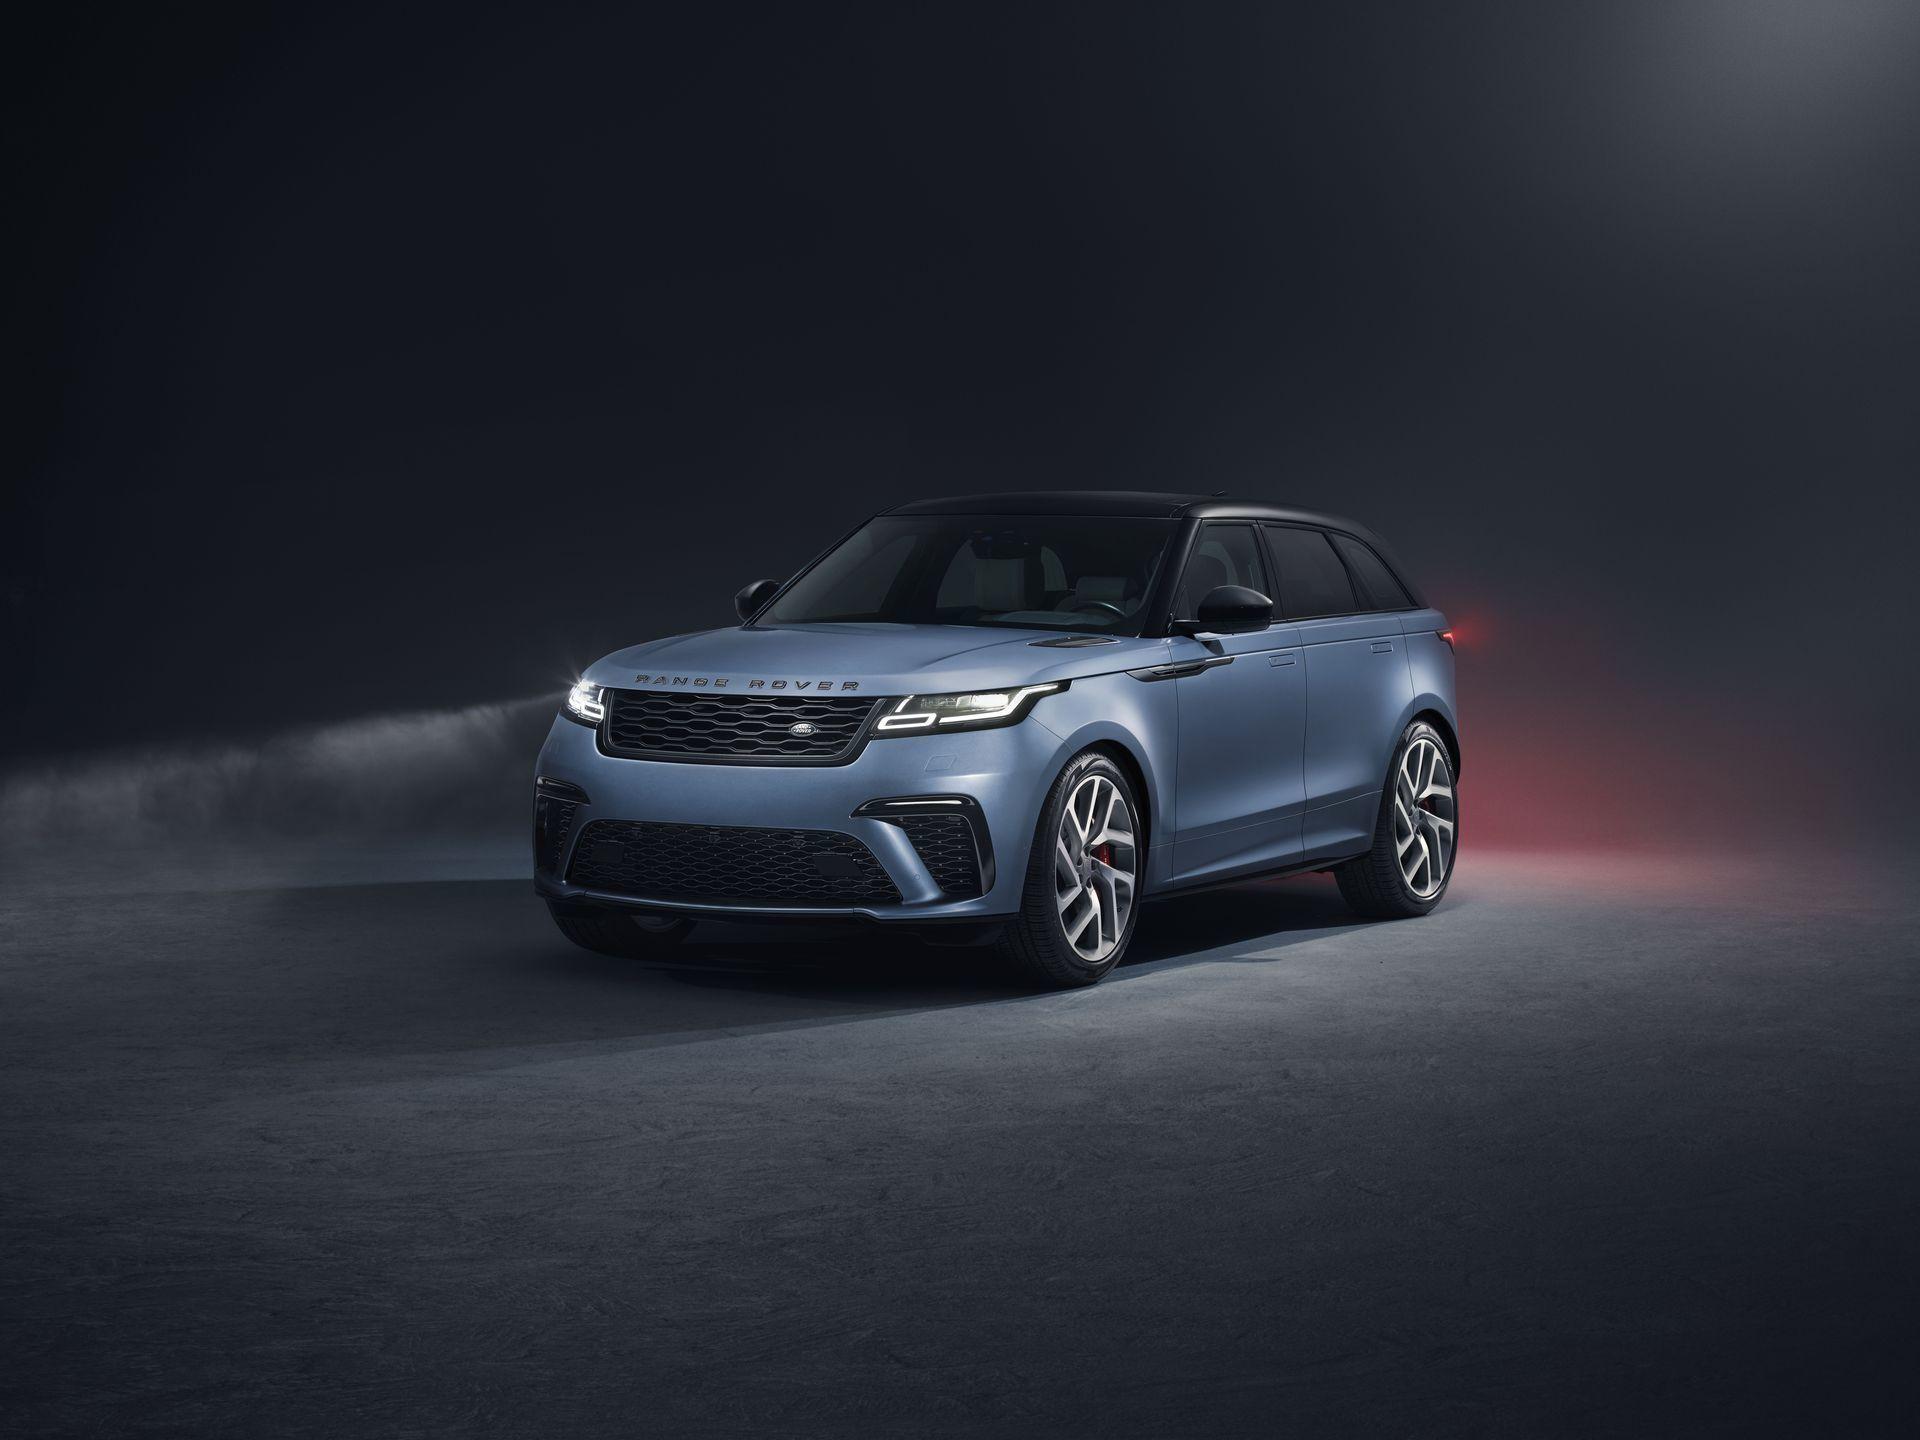 Range Rover Velar Svautobiography 6